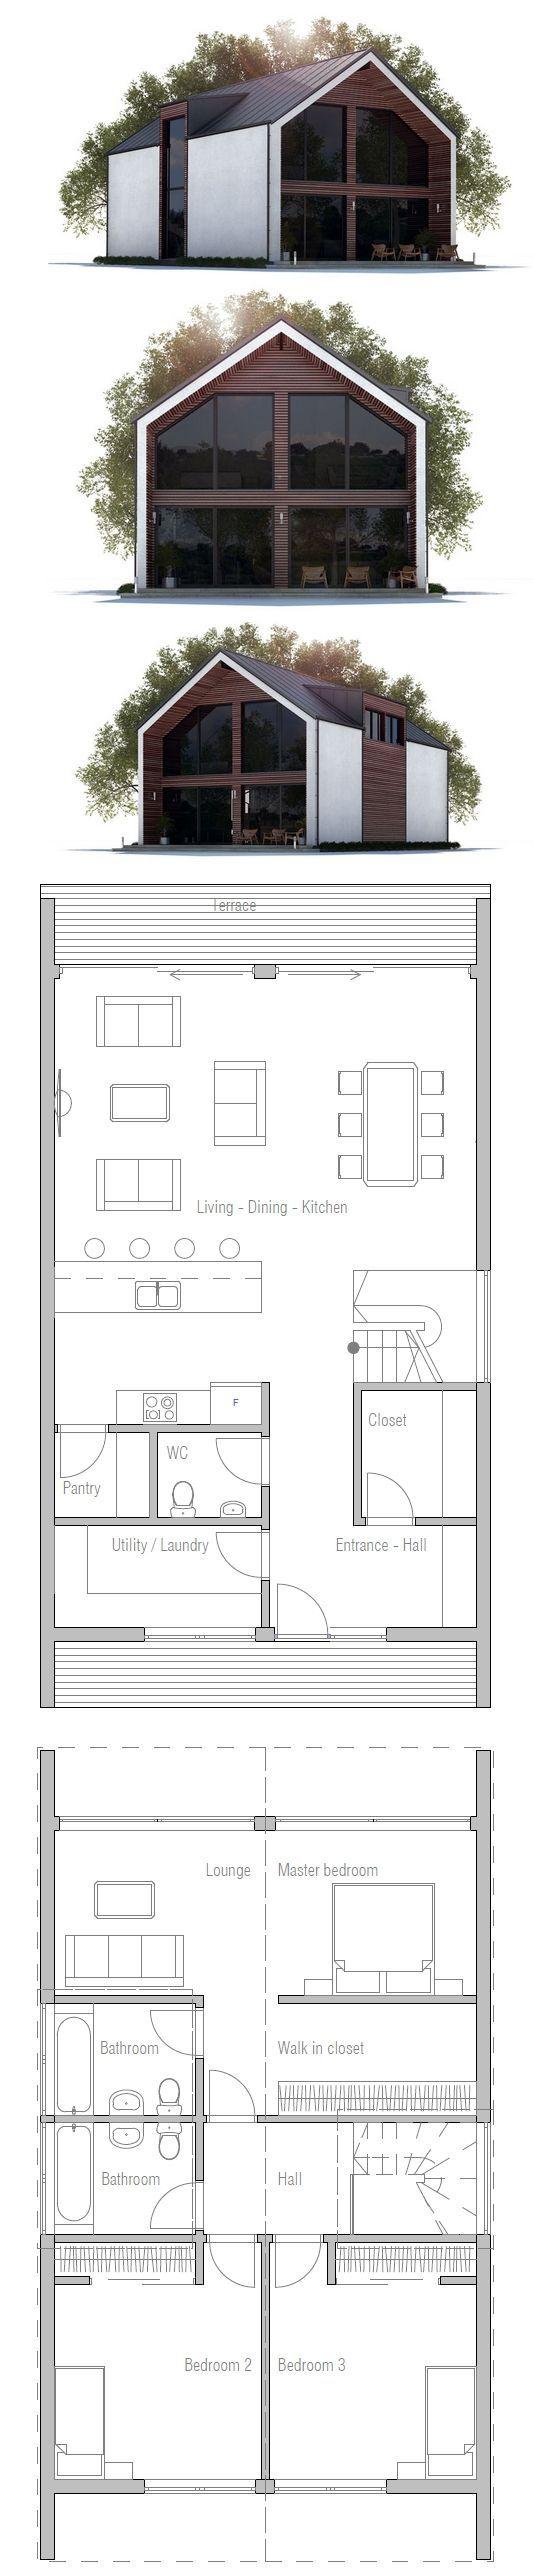 Small House Plan to narrow lot.: